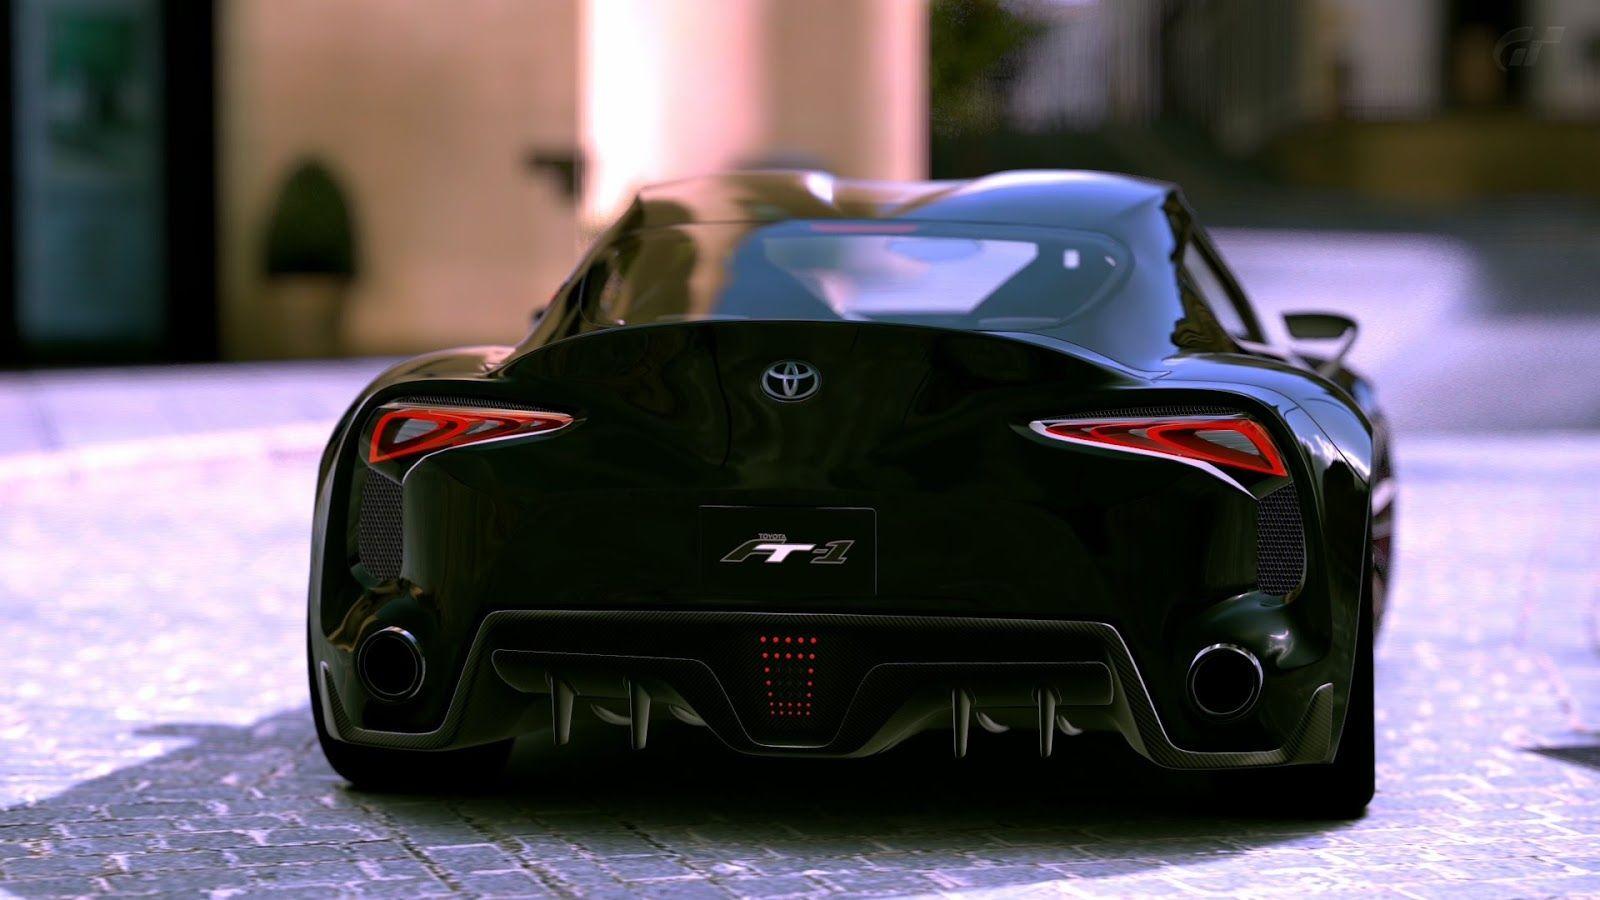 Toyota Supra 2016 Celica Cars Tuner Concept